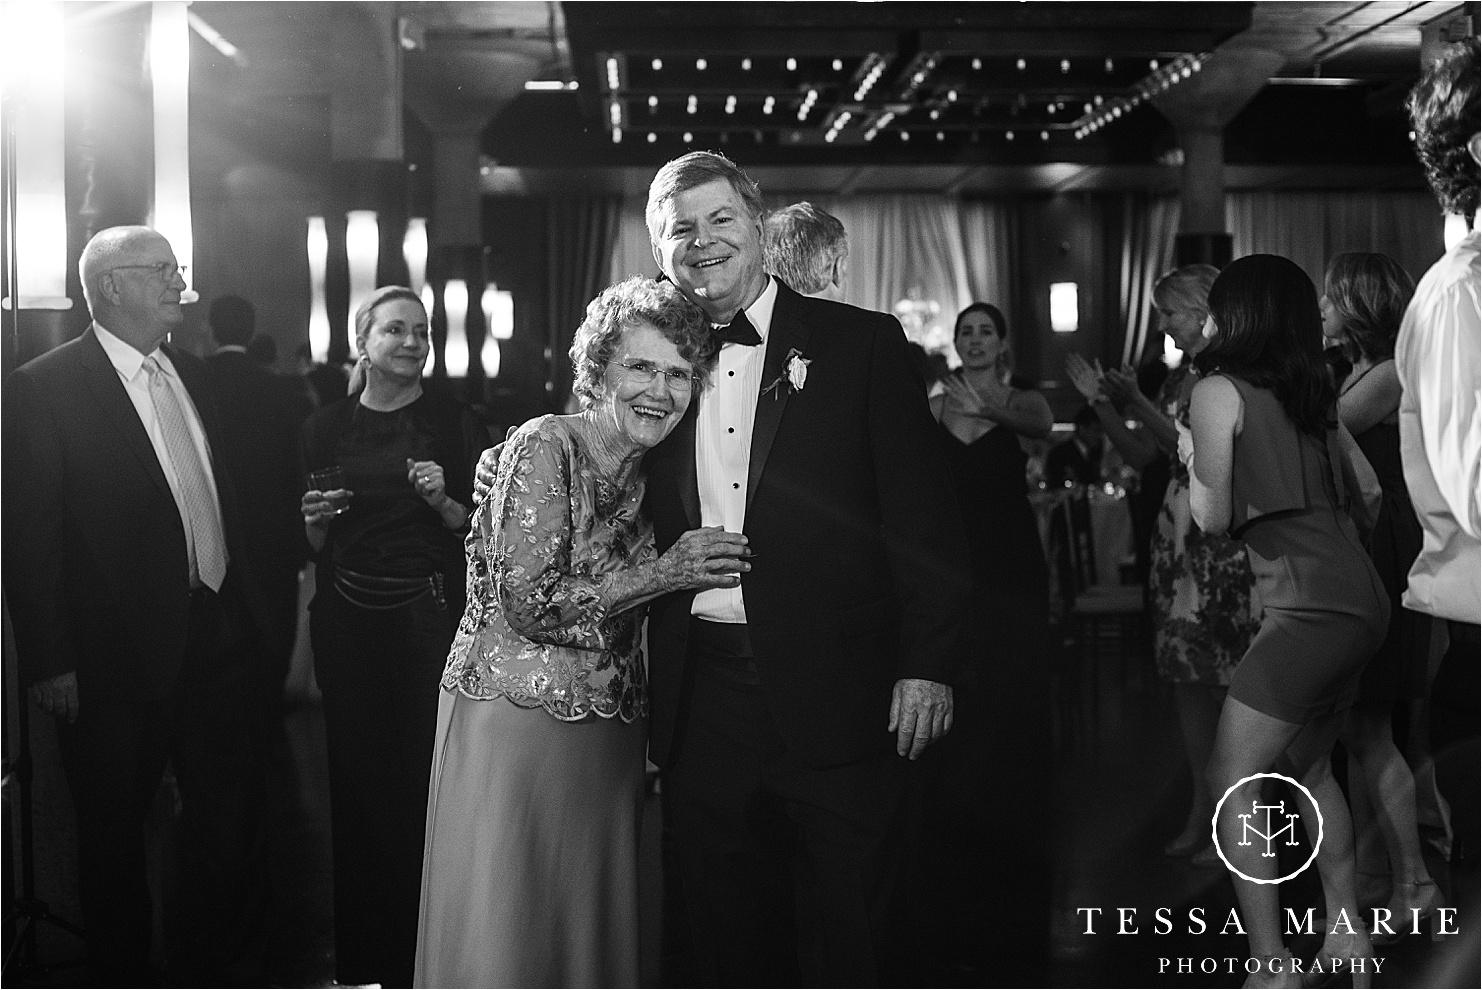 Tessa_marie_weddings_houston_wedding_photographer_The_astorian_0179.jpg